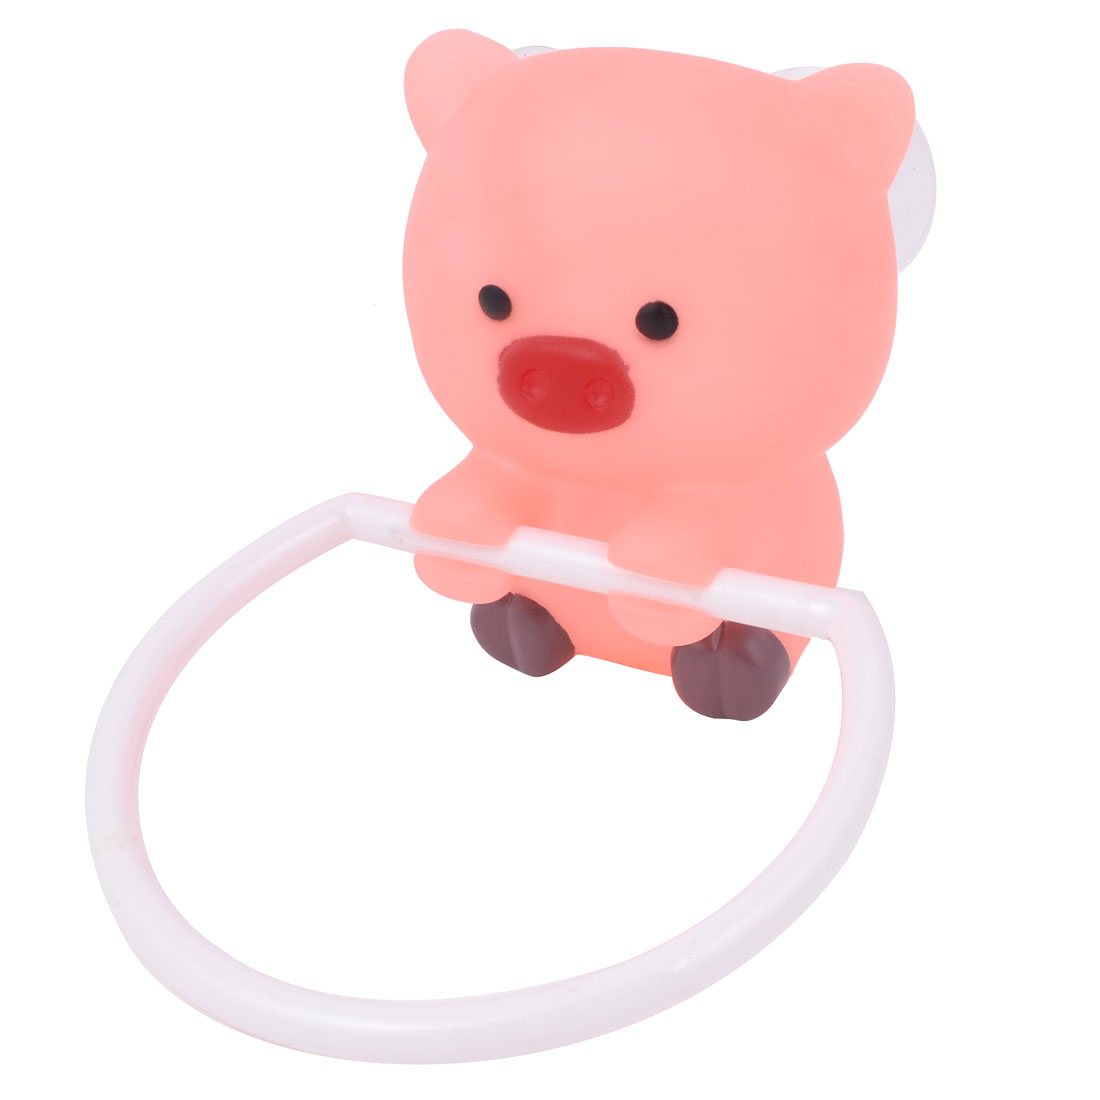 Bathroom Plastic Cartoon Pig Shaped Round Ring Towel Hanger Holder